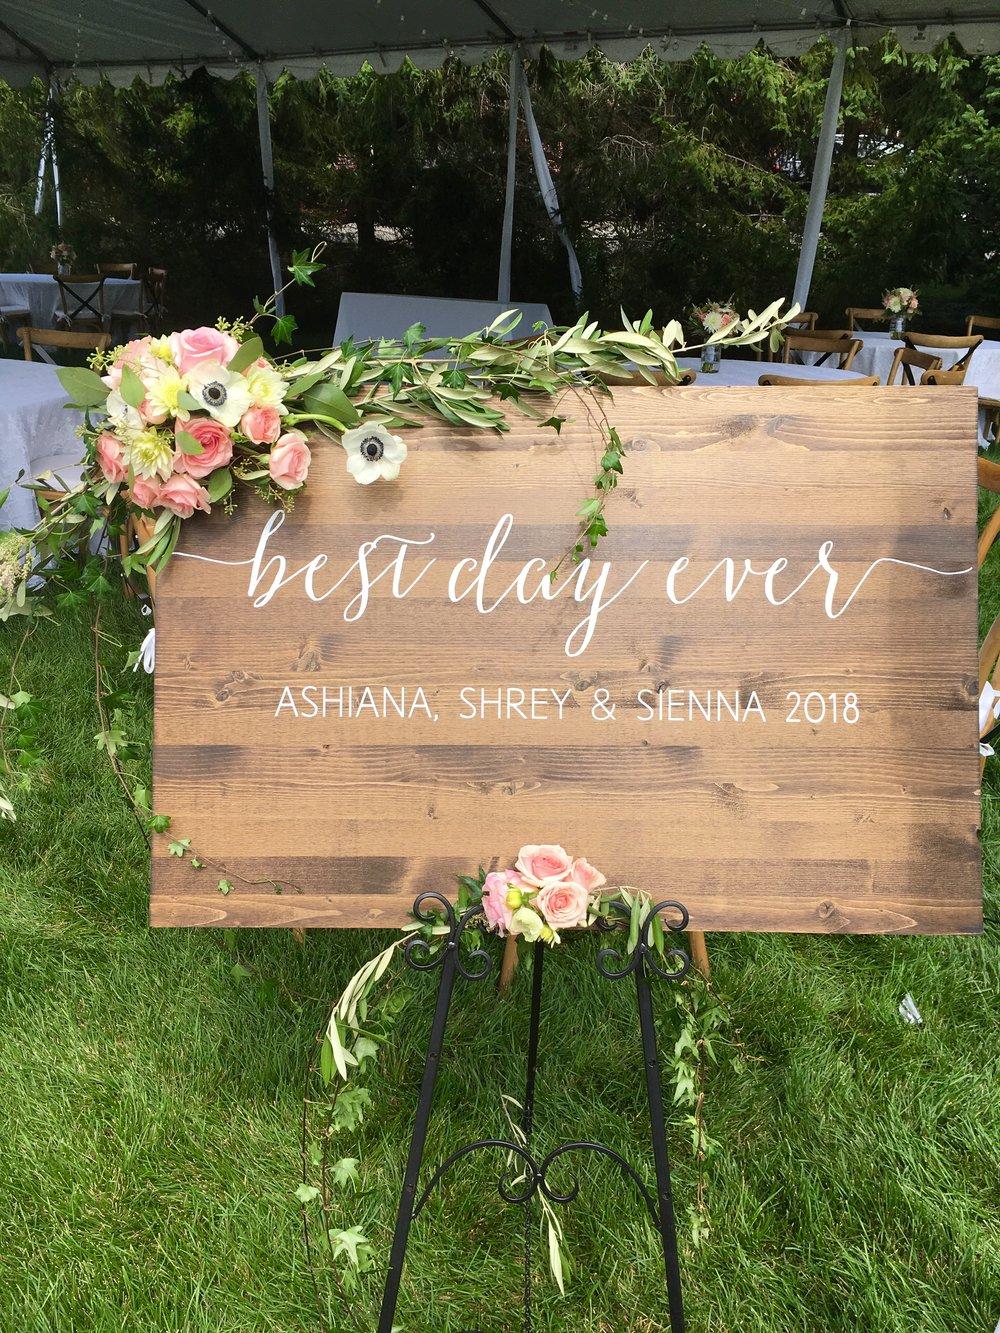 Florescence Flower Studio Event board decor